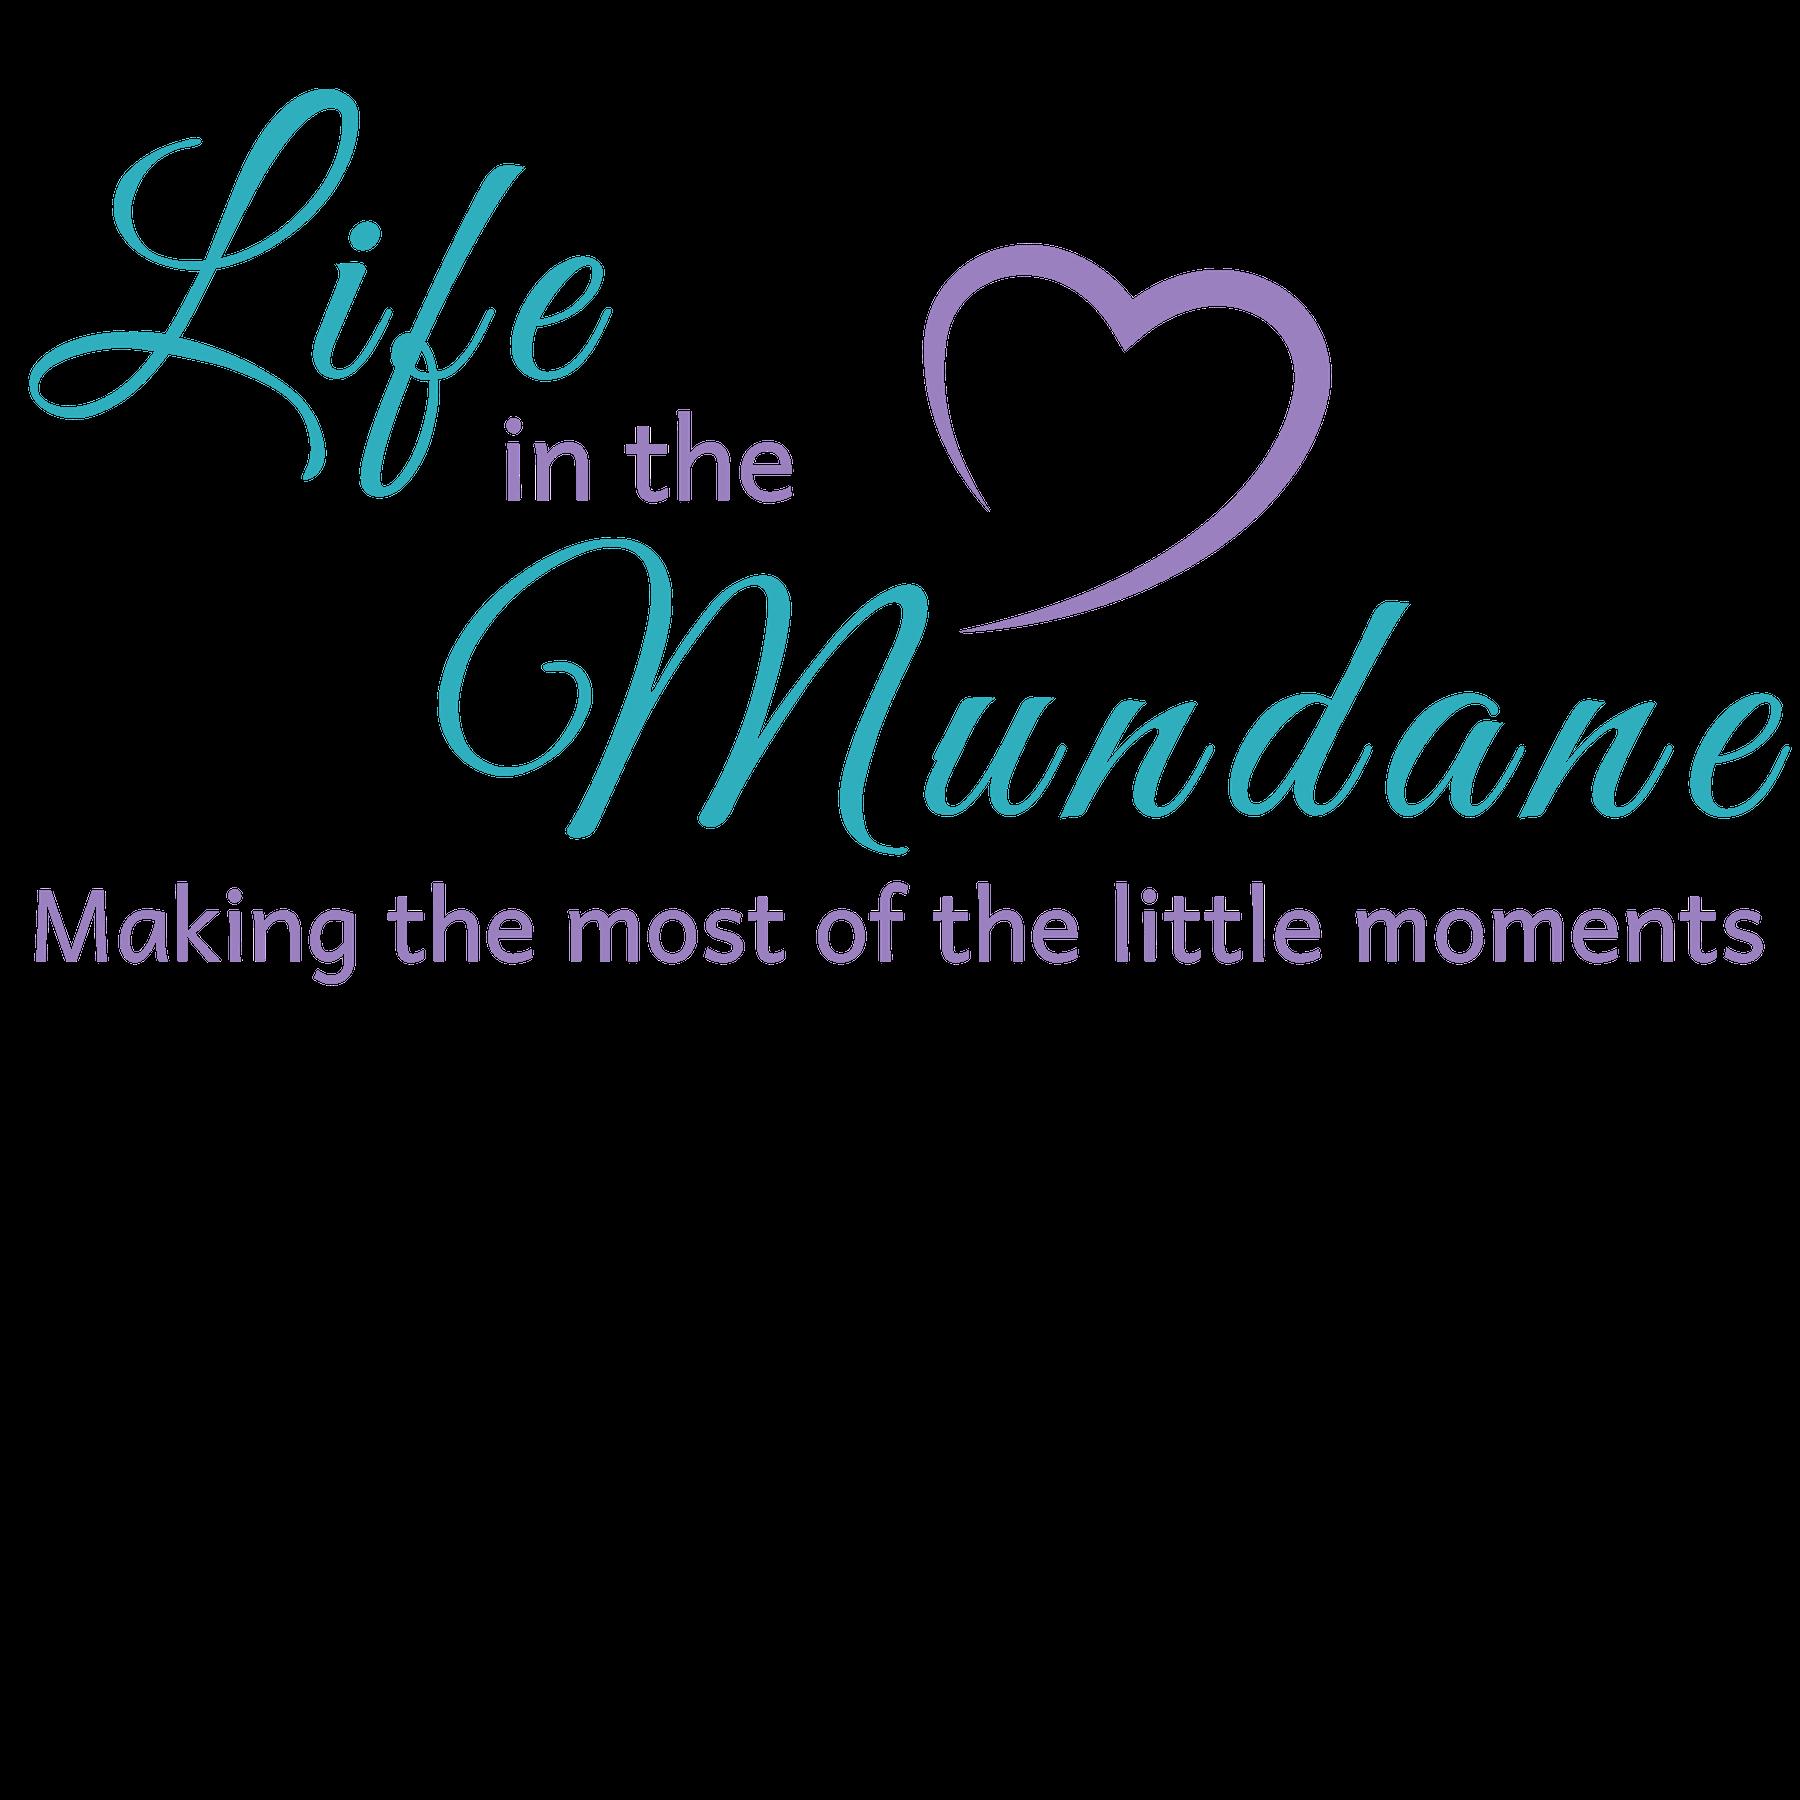 Life in The Mundane